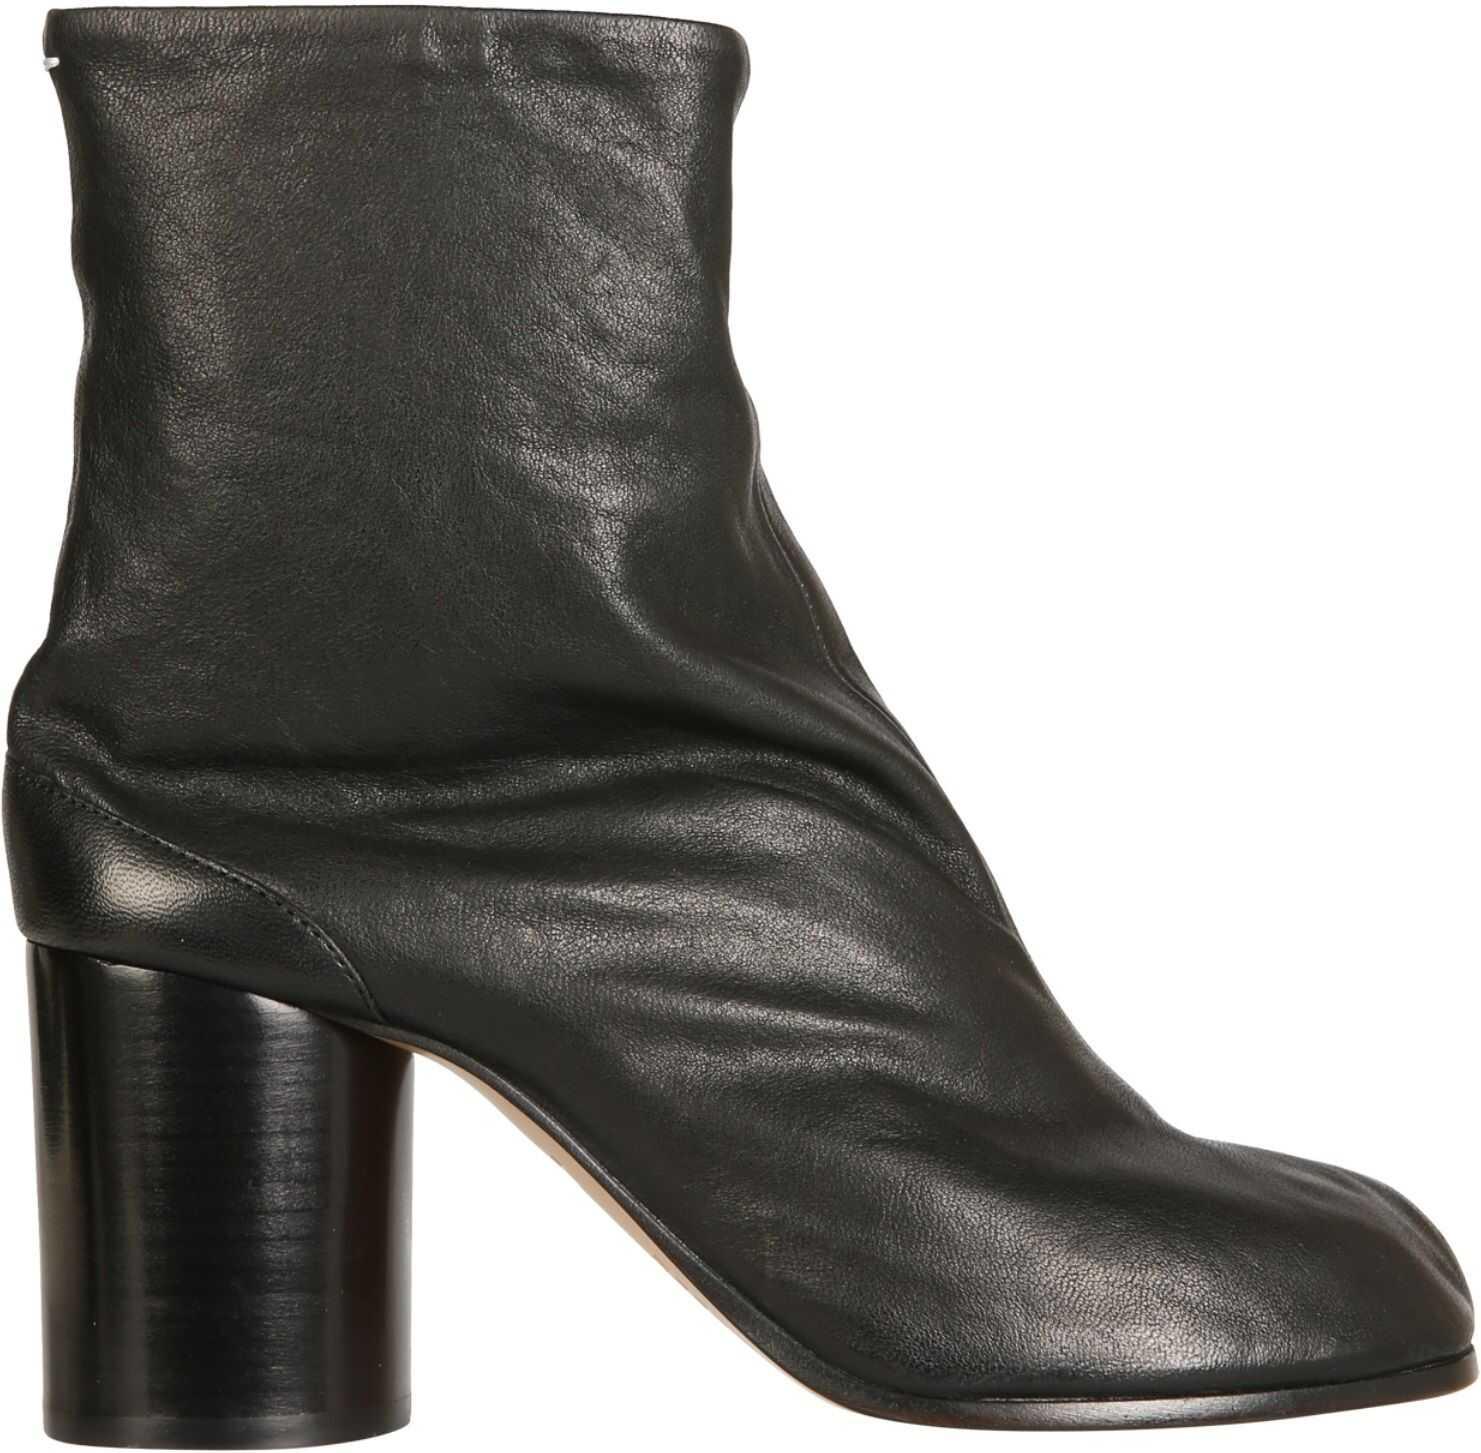 Maison Margiela Tabi Boots S58WU0260_P3753T8013 BLACK imagine b-mall.ro